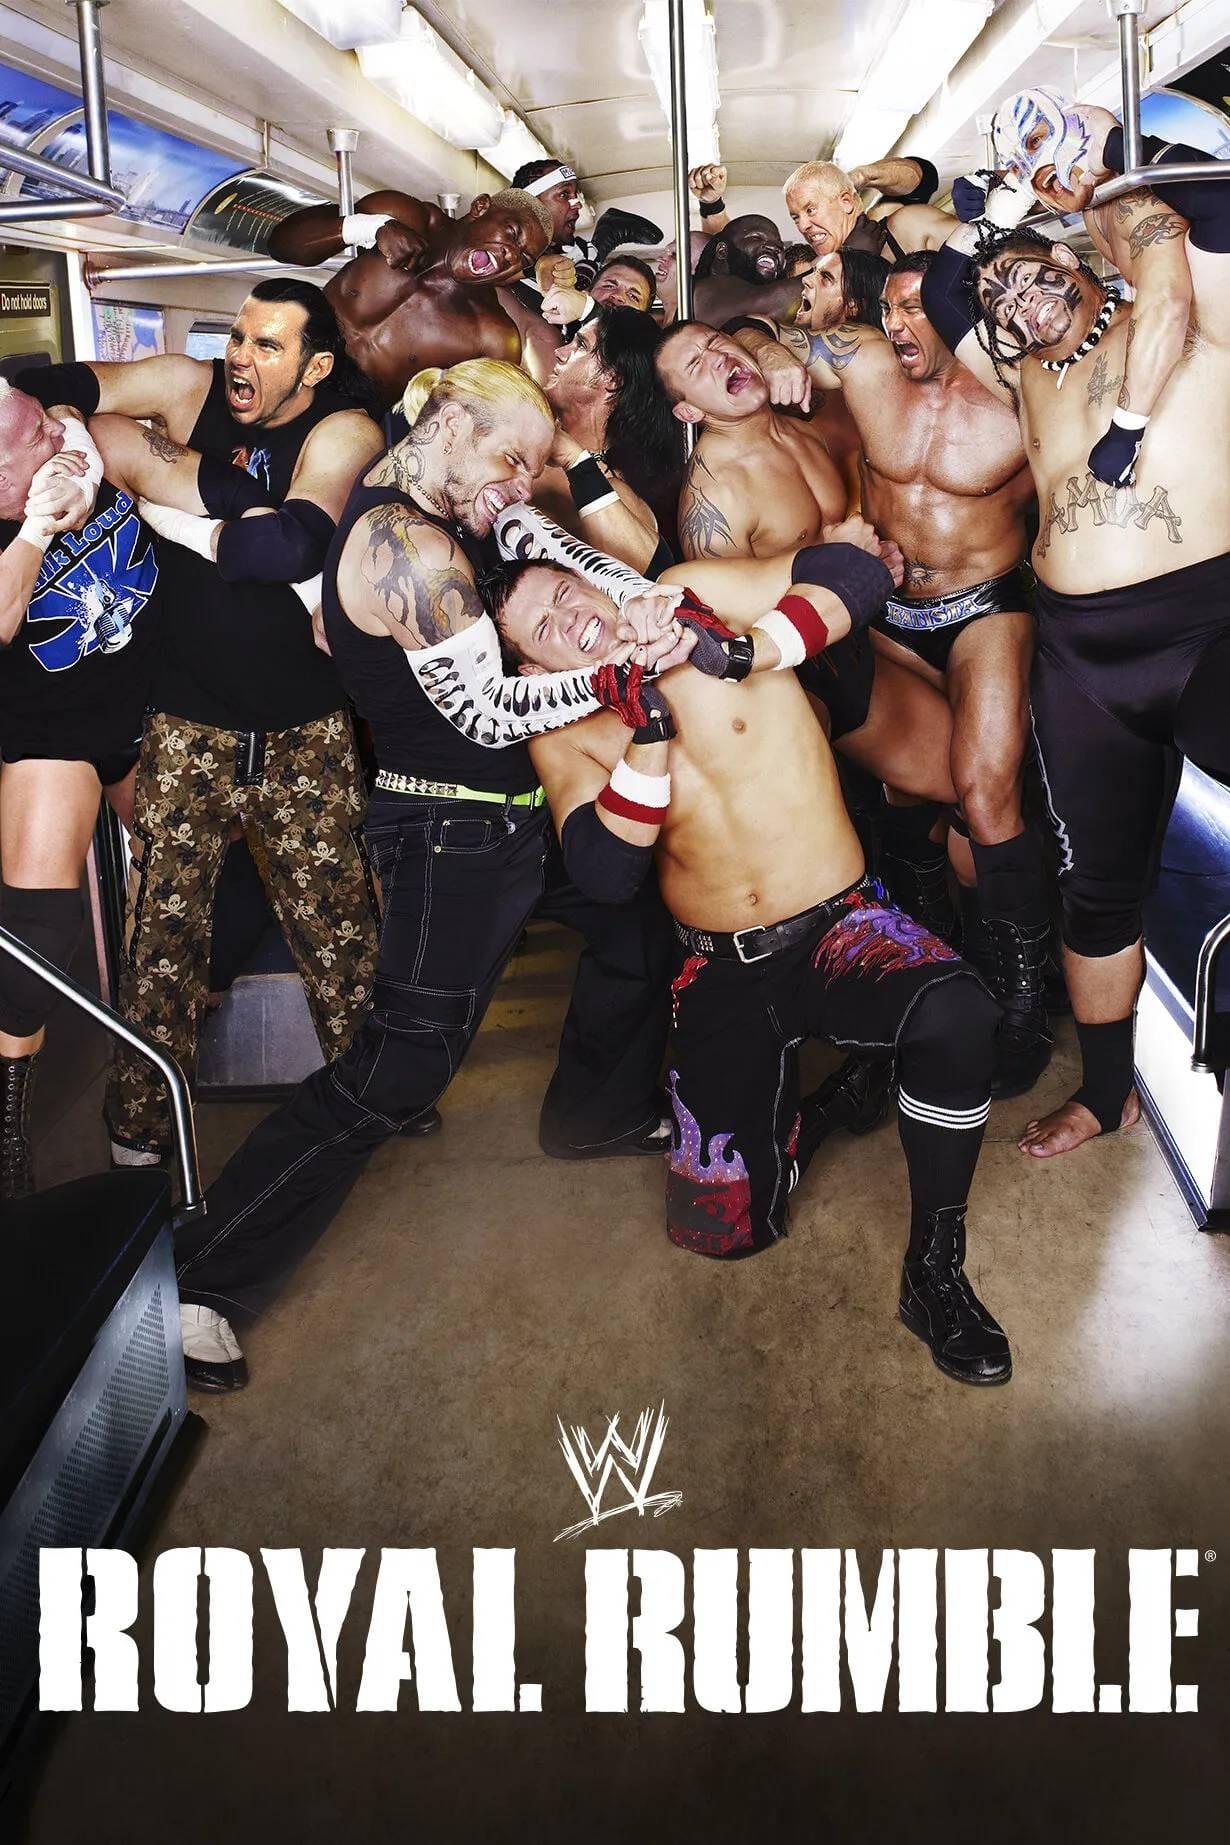 WWE Royal Rumble 2008